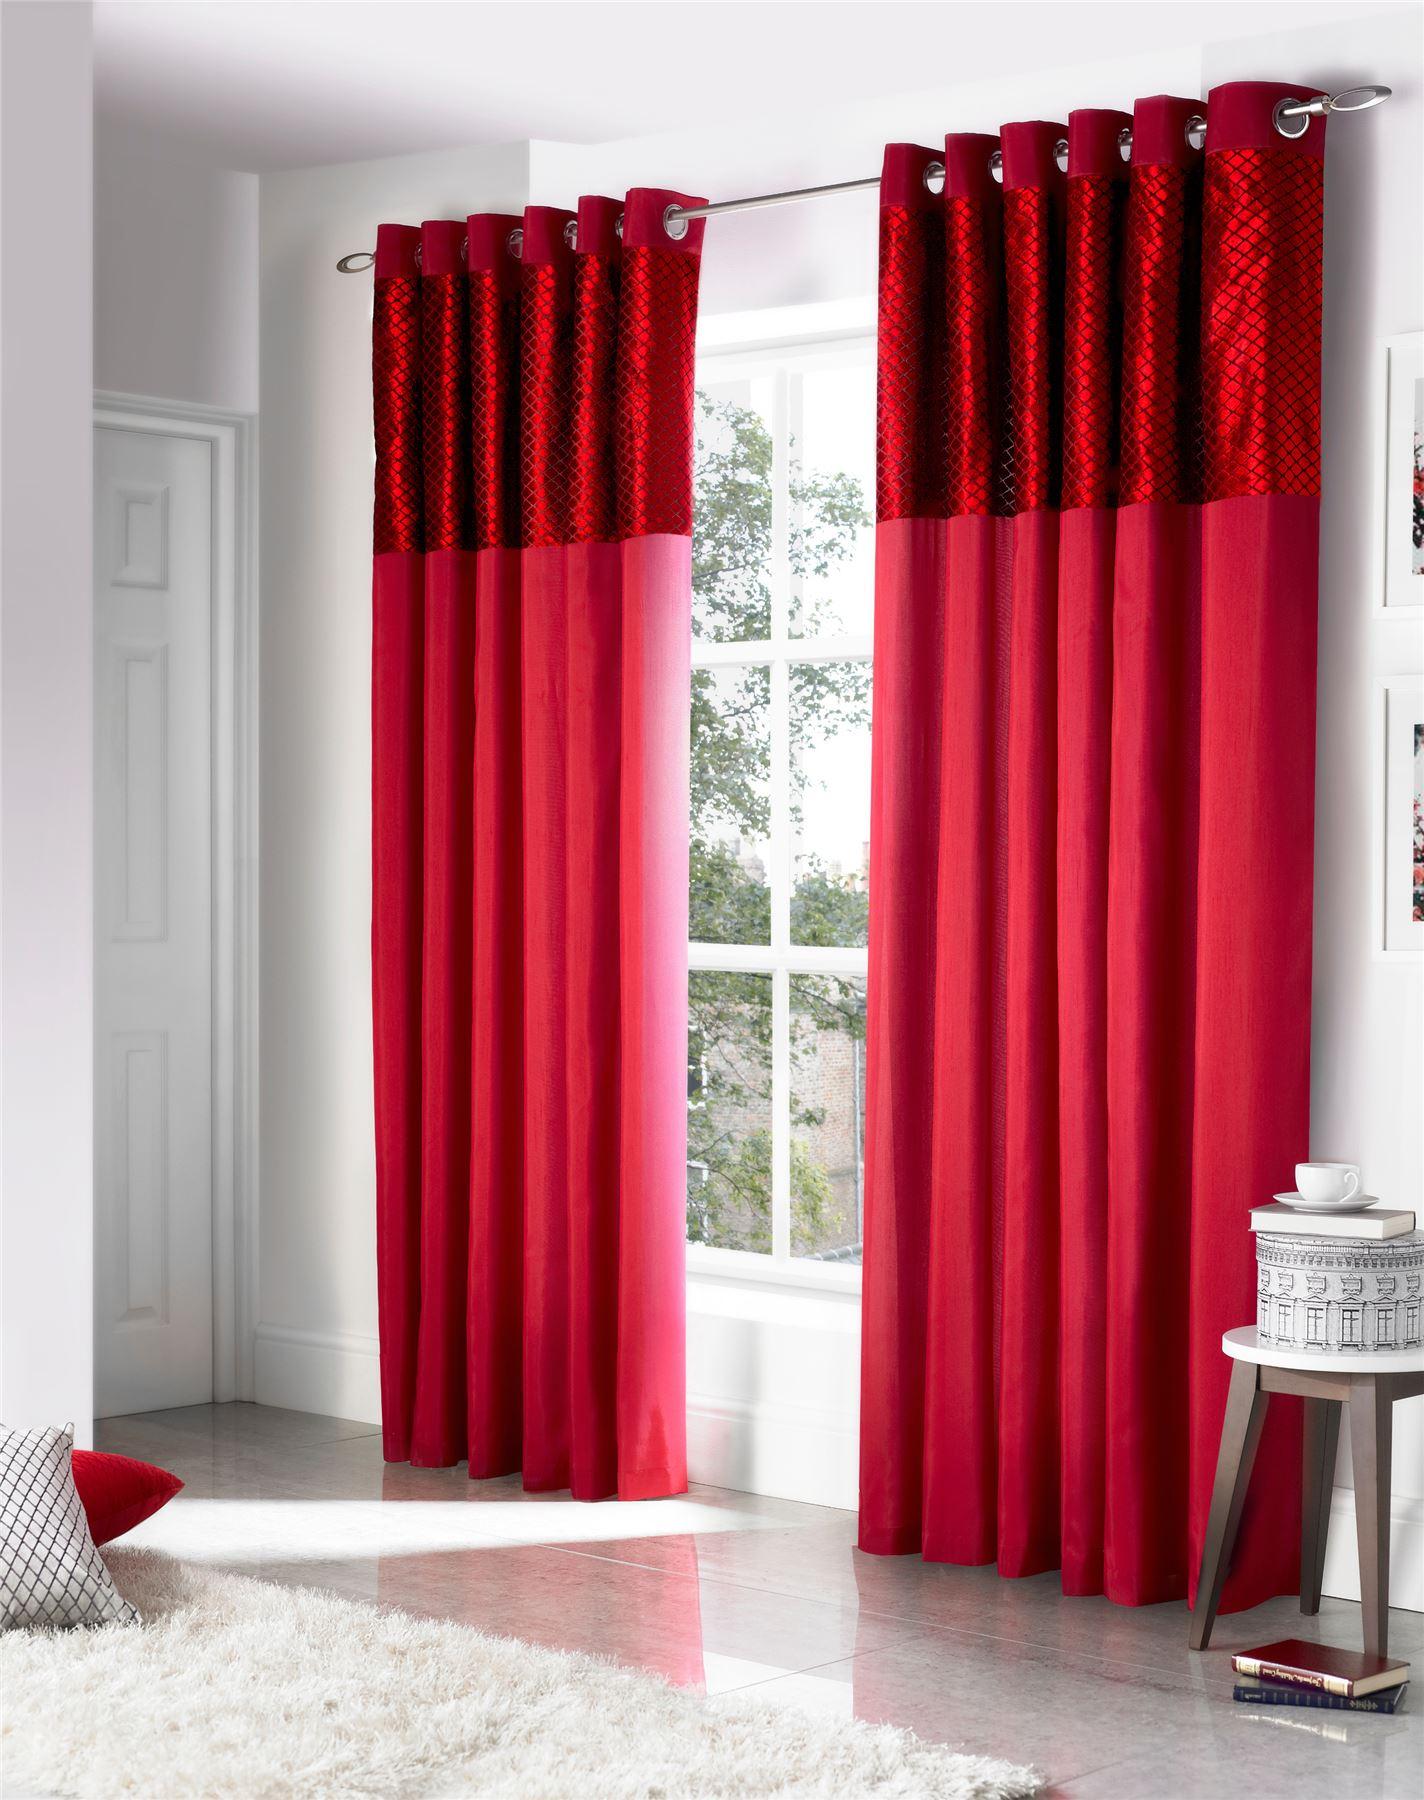 Kohls Drapes | Grommet Curtains | Sheer Panel Curtains